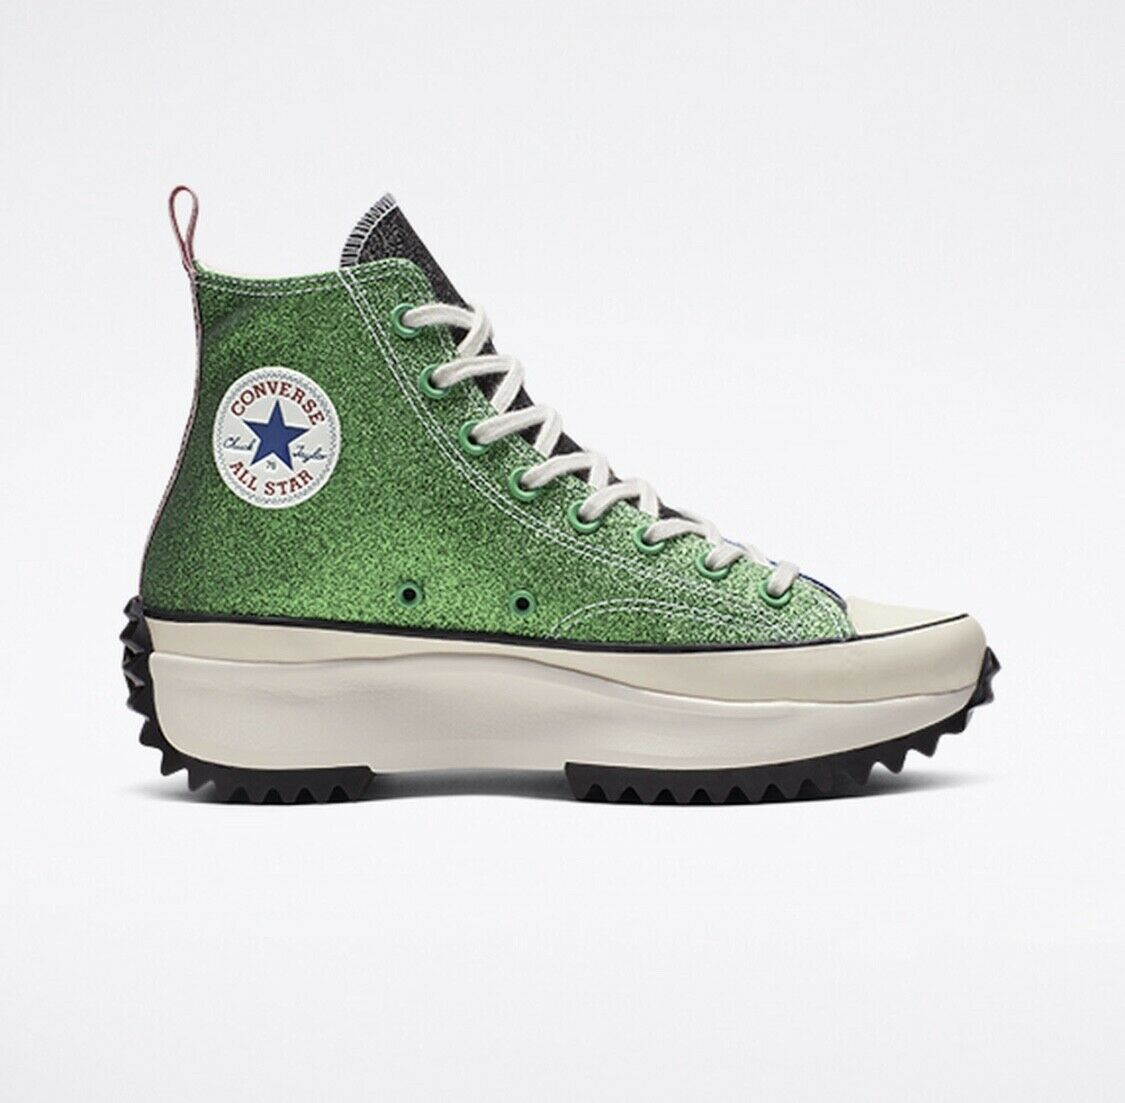 JW Anderson x Converse Run Star Hike Glitter Platform Sneakers